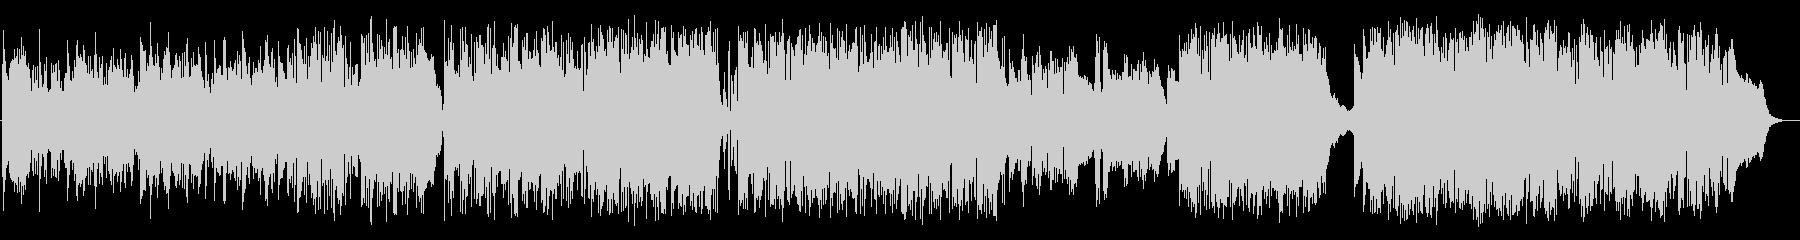 J-POP風スタイリッシュバラードの未再生の波形